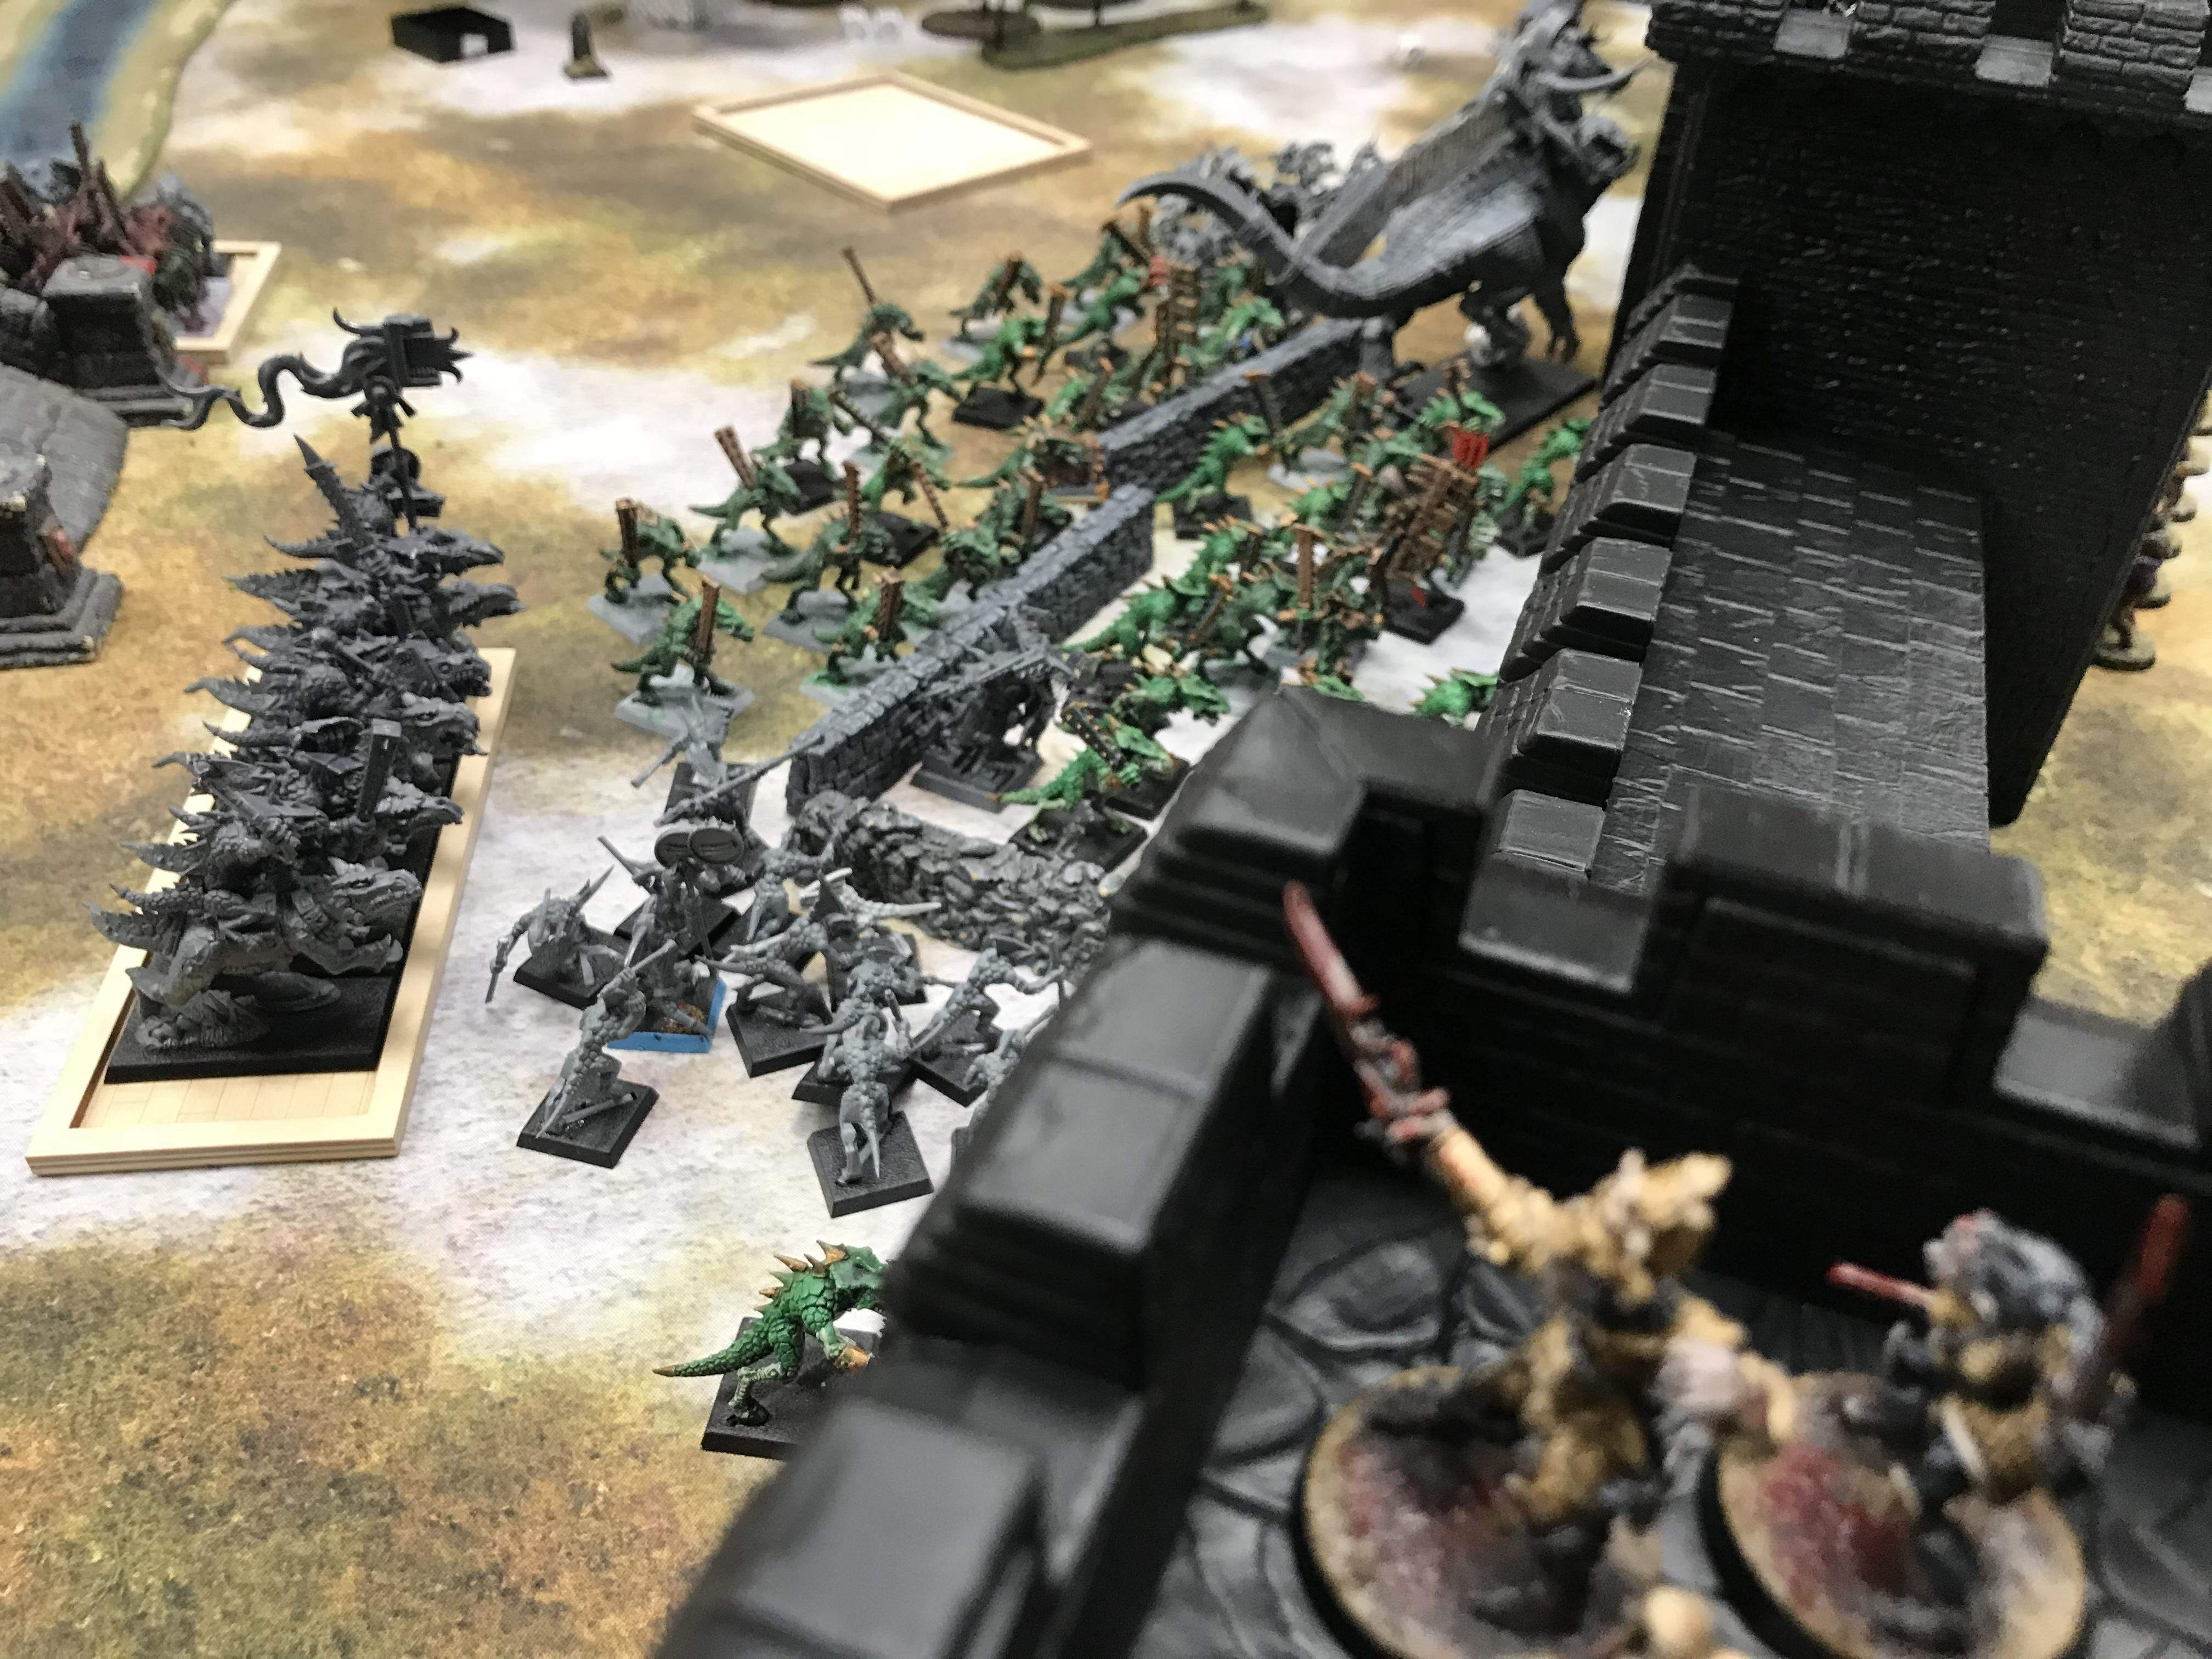 Age, Battle, Dark, Elves, Fortress, Game, Gods, Hold, Lizardmen, Lustria, Narrative, Necromancy, Of, Open, Out, Play, Seige, Sigmar, Slaanesh, Themed, Undead, Warhammer Fantasy